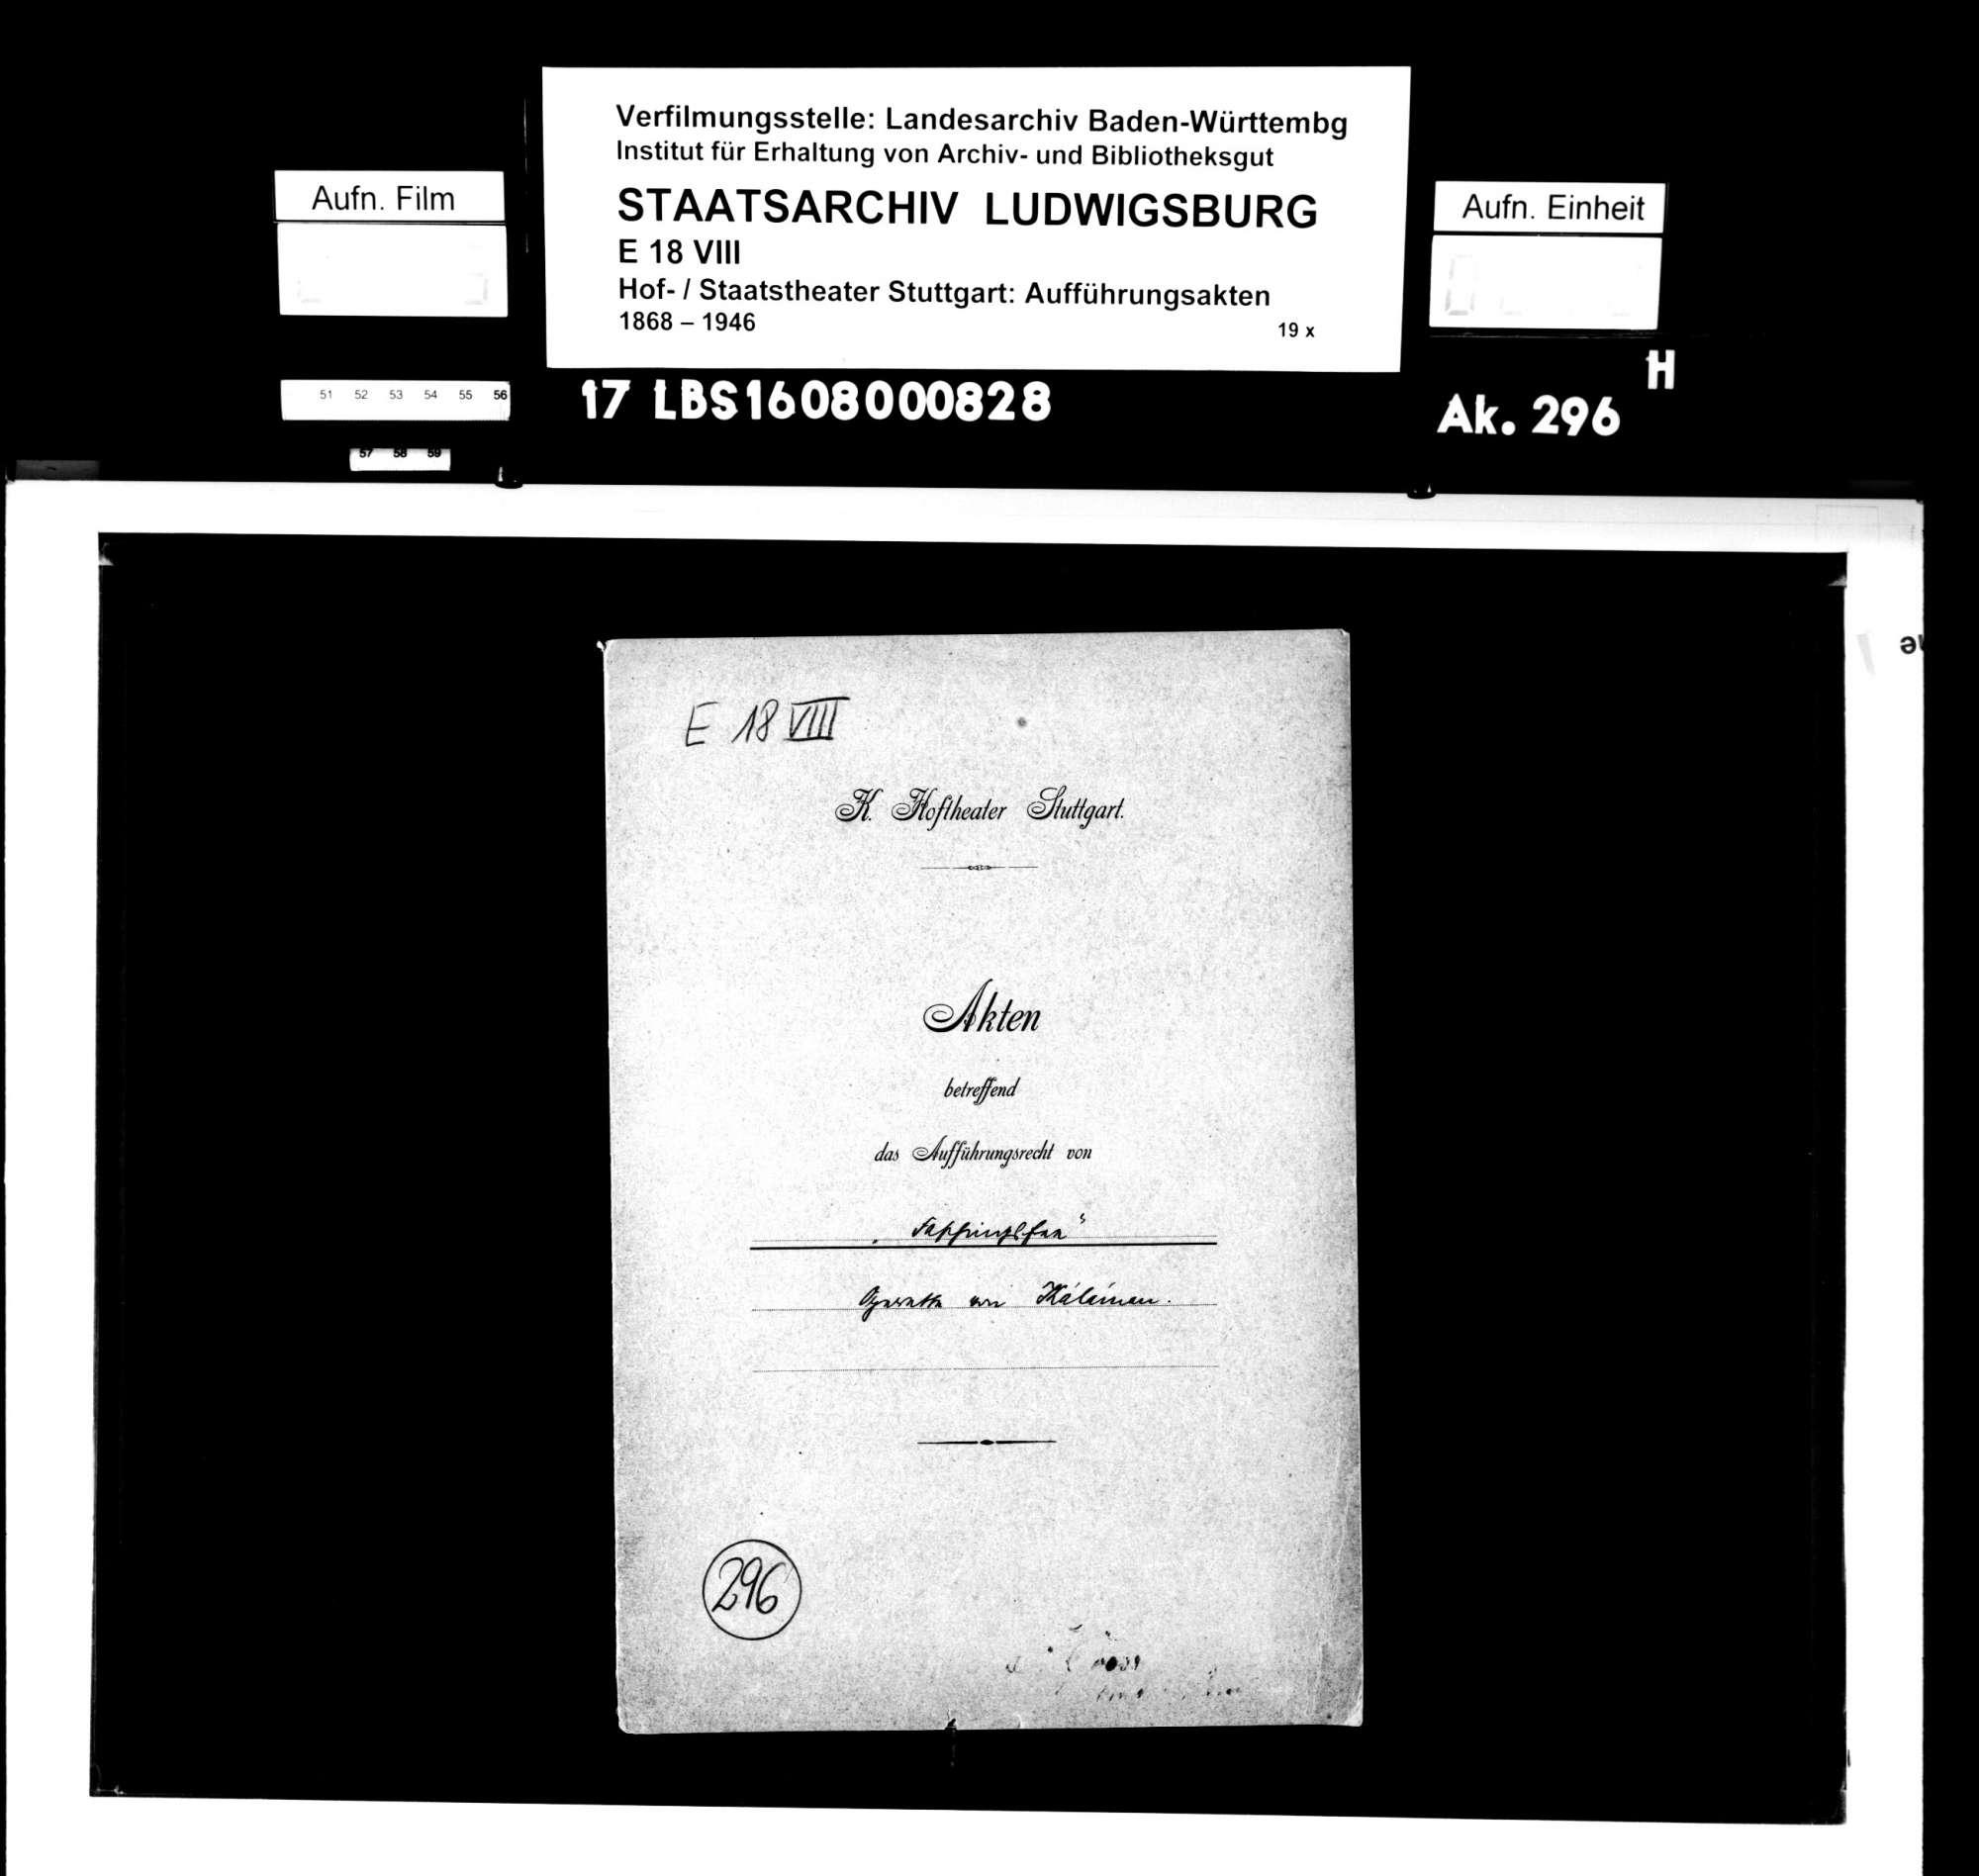 Faschingsfee. Operette von Imre Kalman, Bild 1